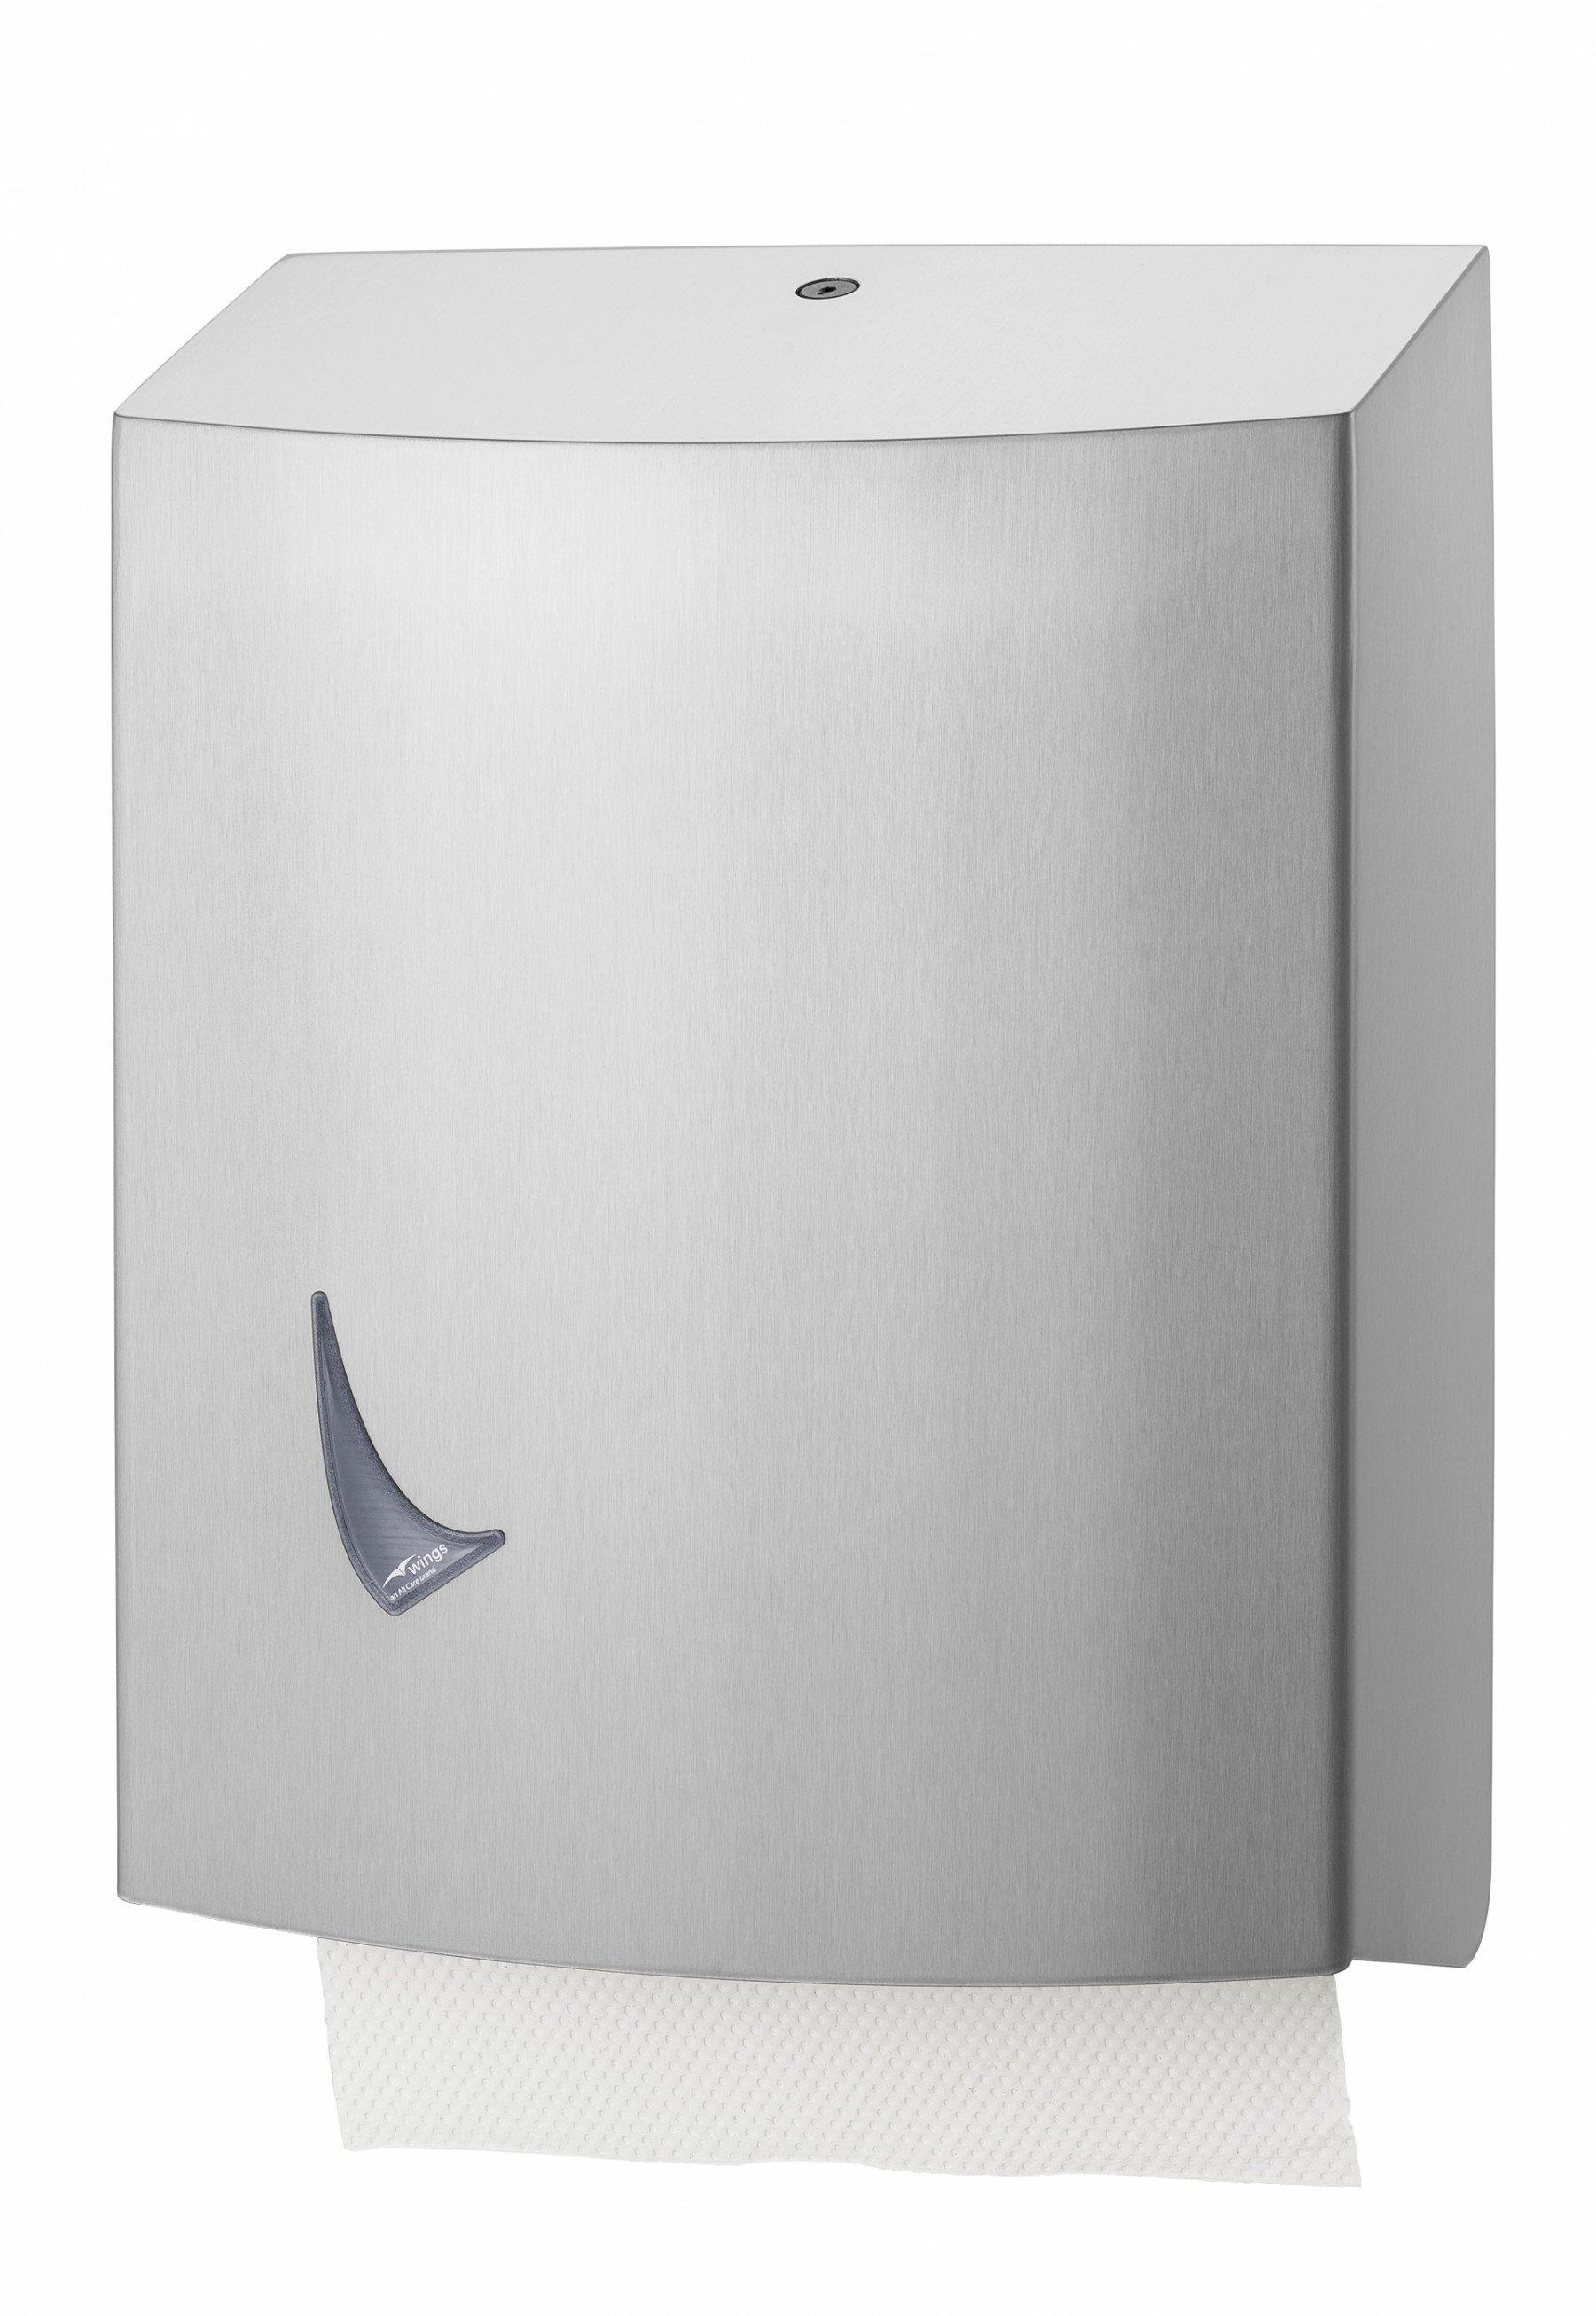 Wings | Handdoekdispenser | Groot | RVS